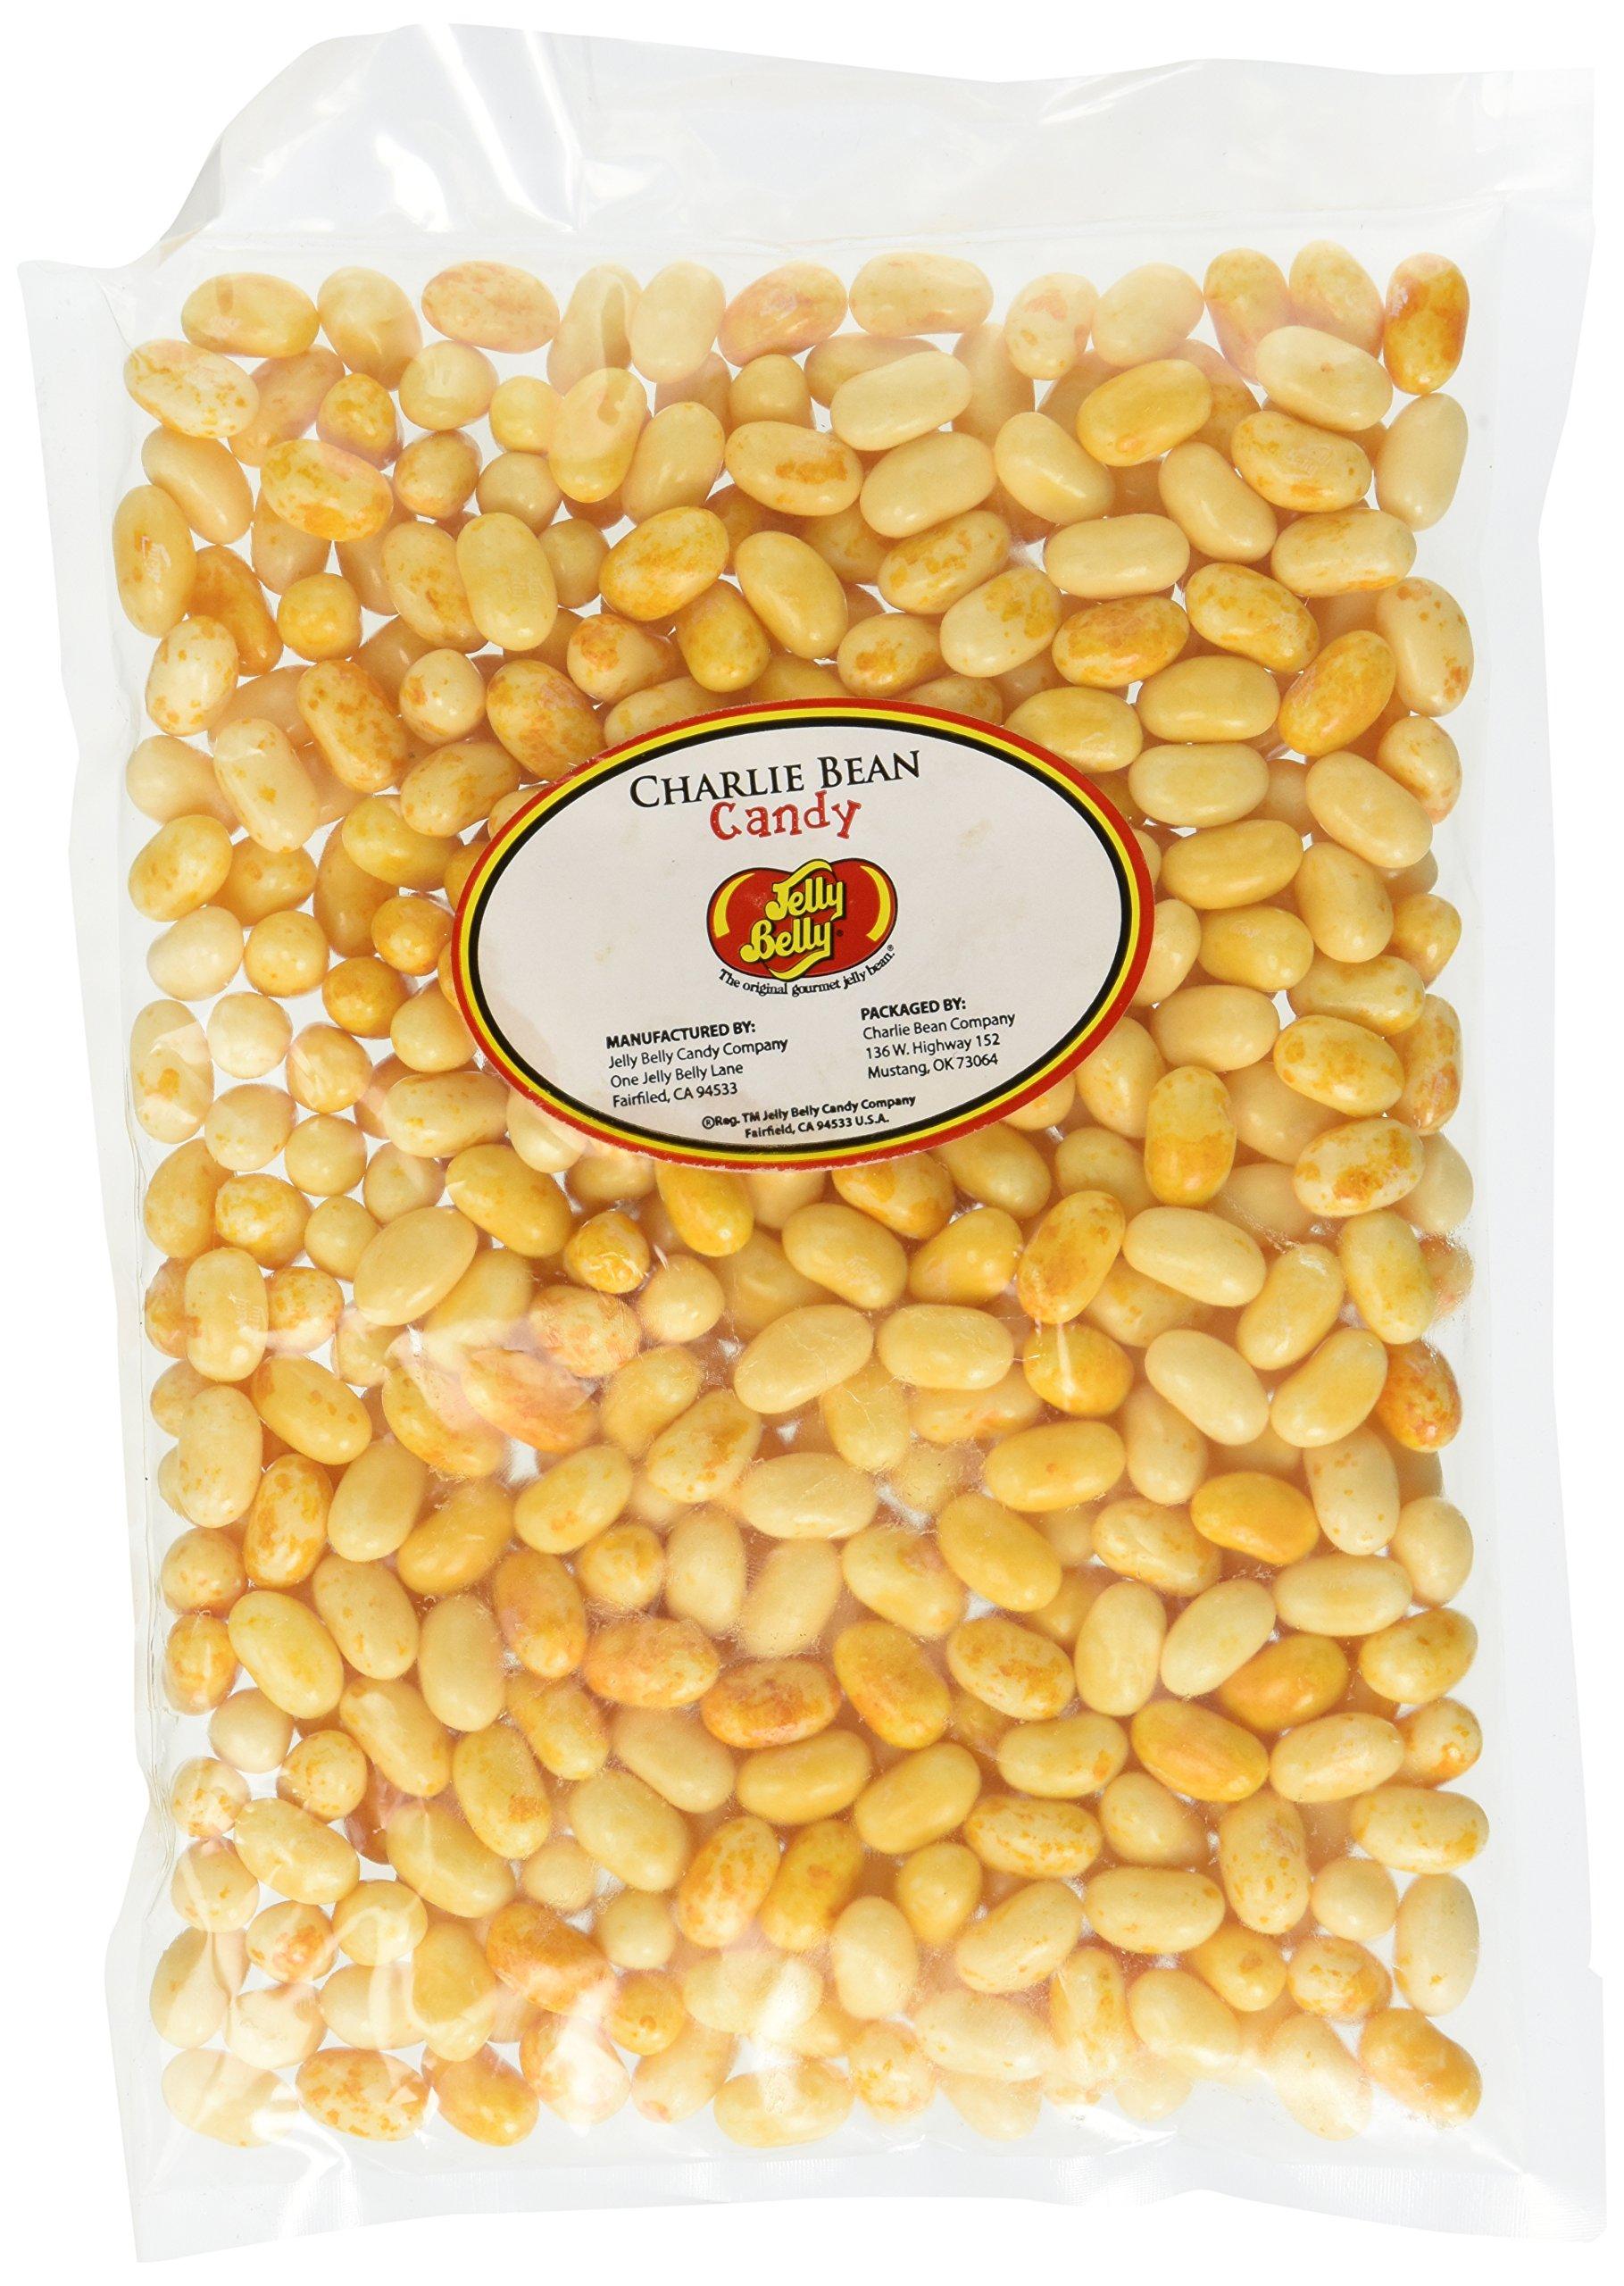 Jelly Belly Caramel Corn 1lb Bag by Jelly Belly